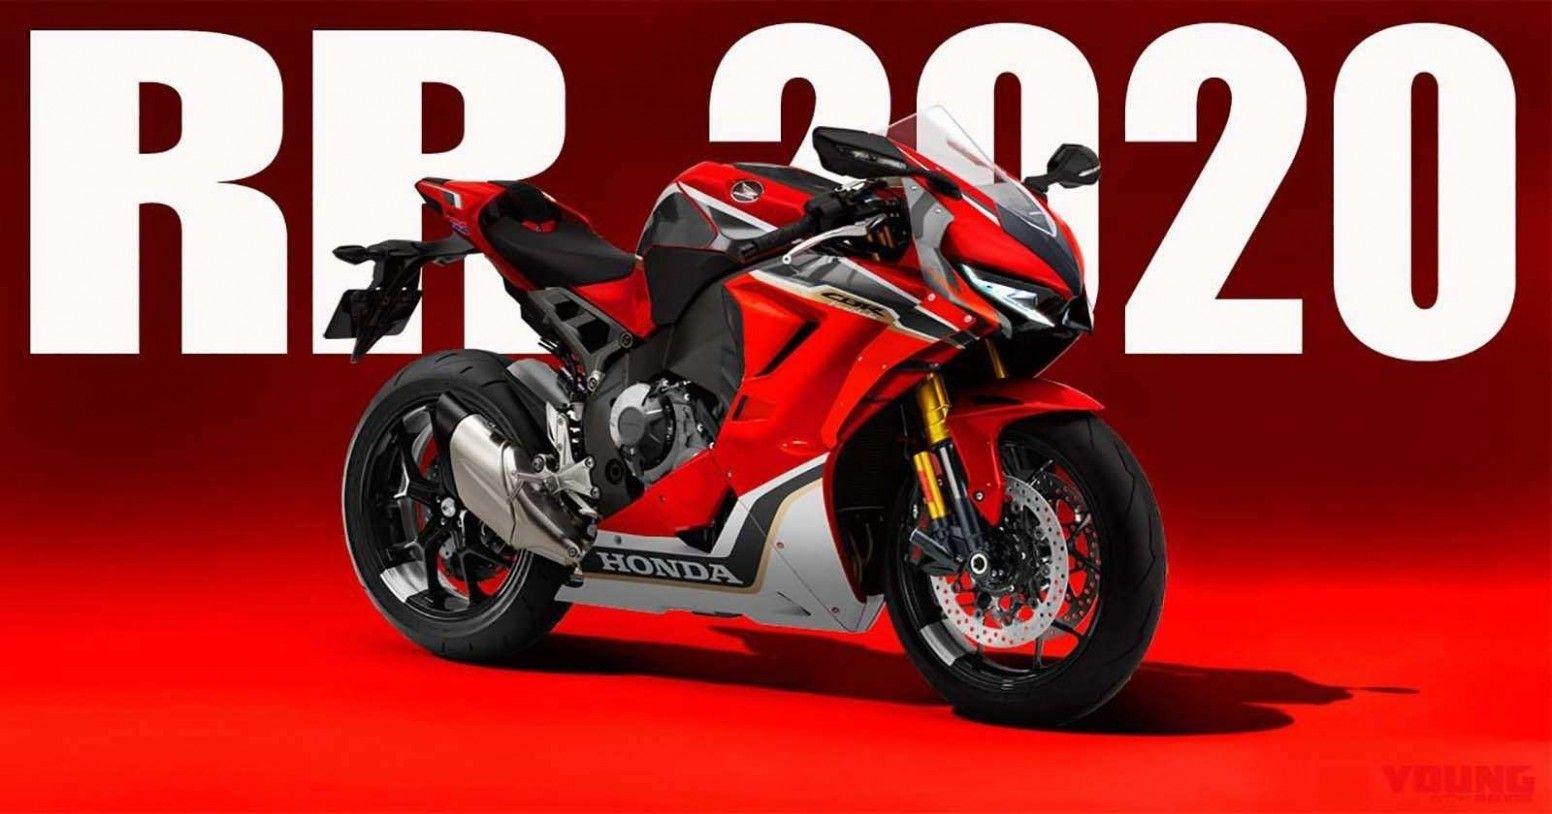 Honda Wsbk 2020 Release Honda Honda Motorcycles Motorcycle